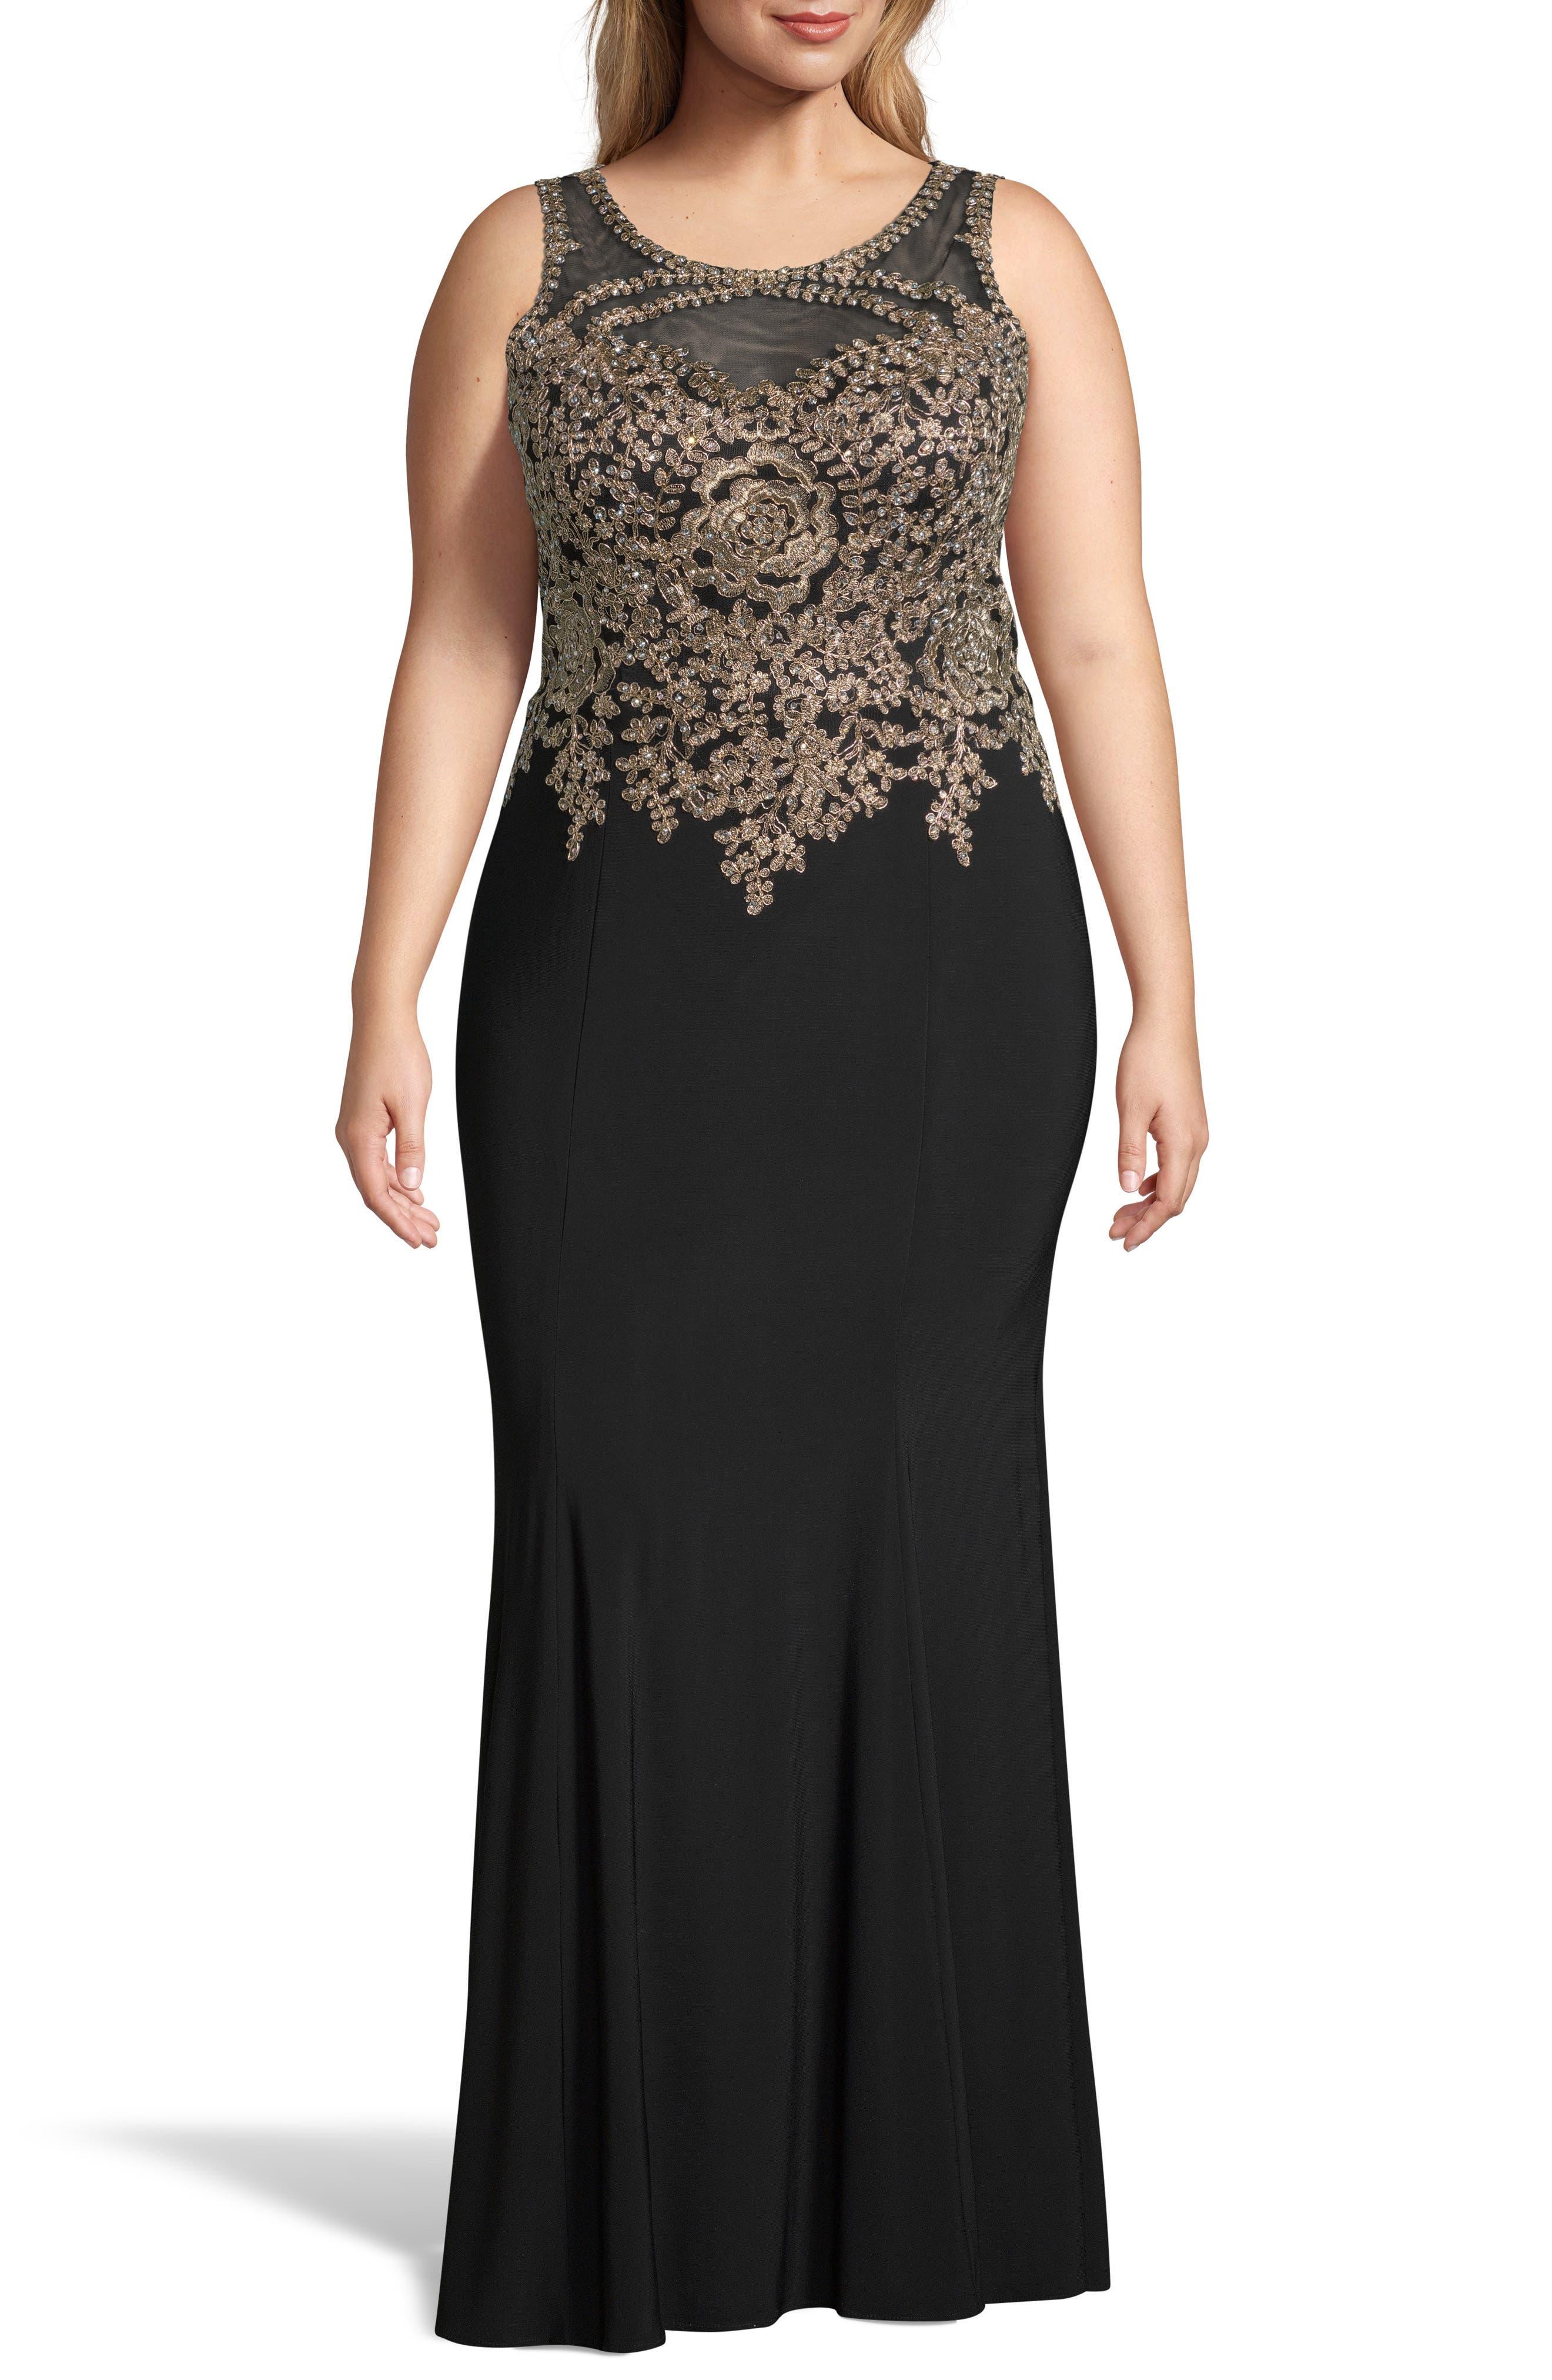 Plus Size Xscape Golden Embroidered Bodice Evening Dress, Black